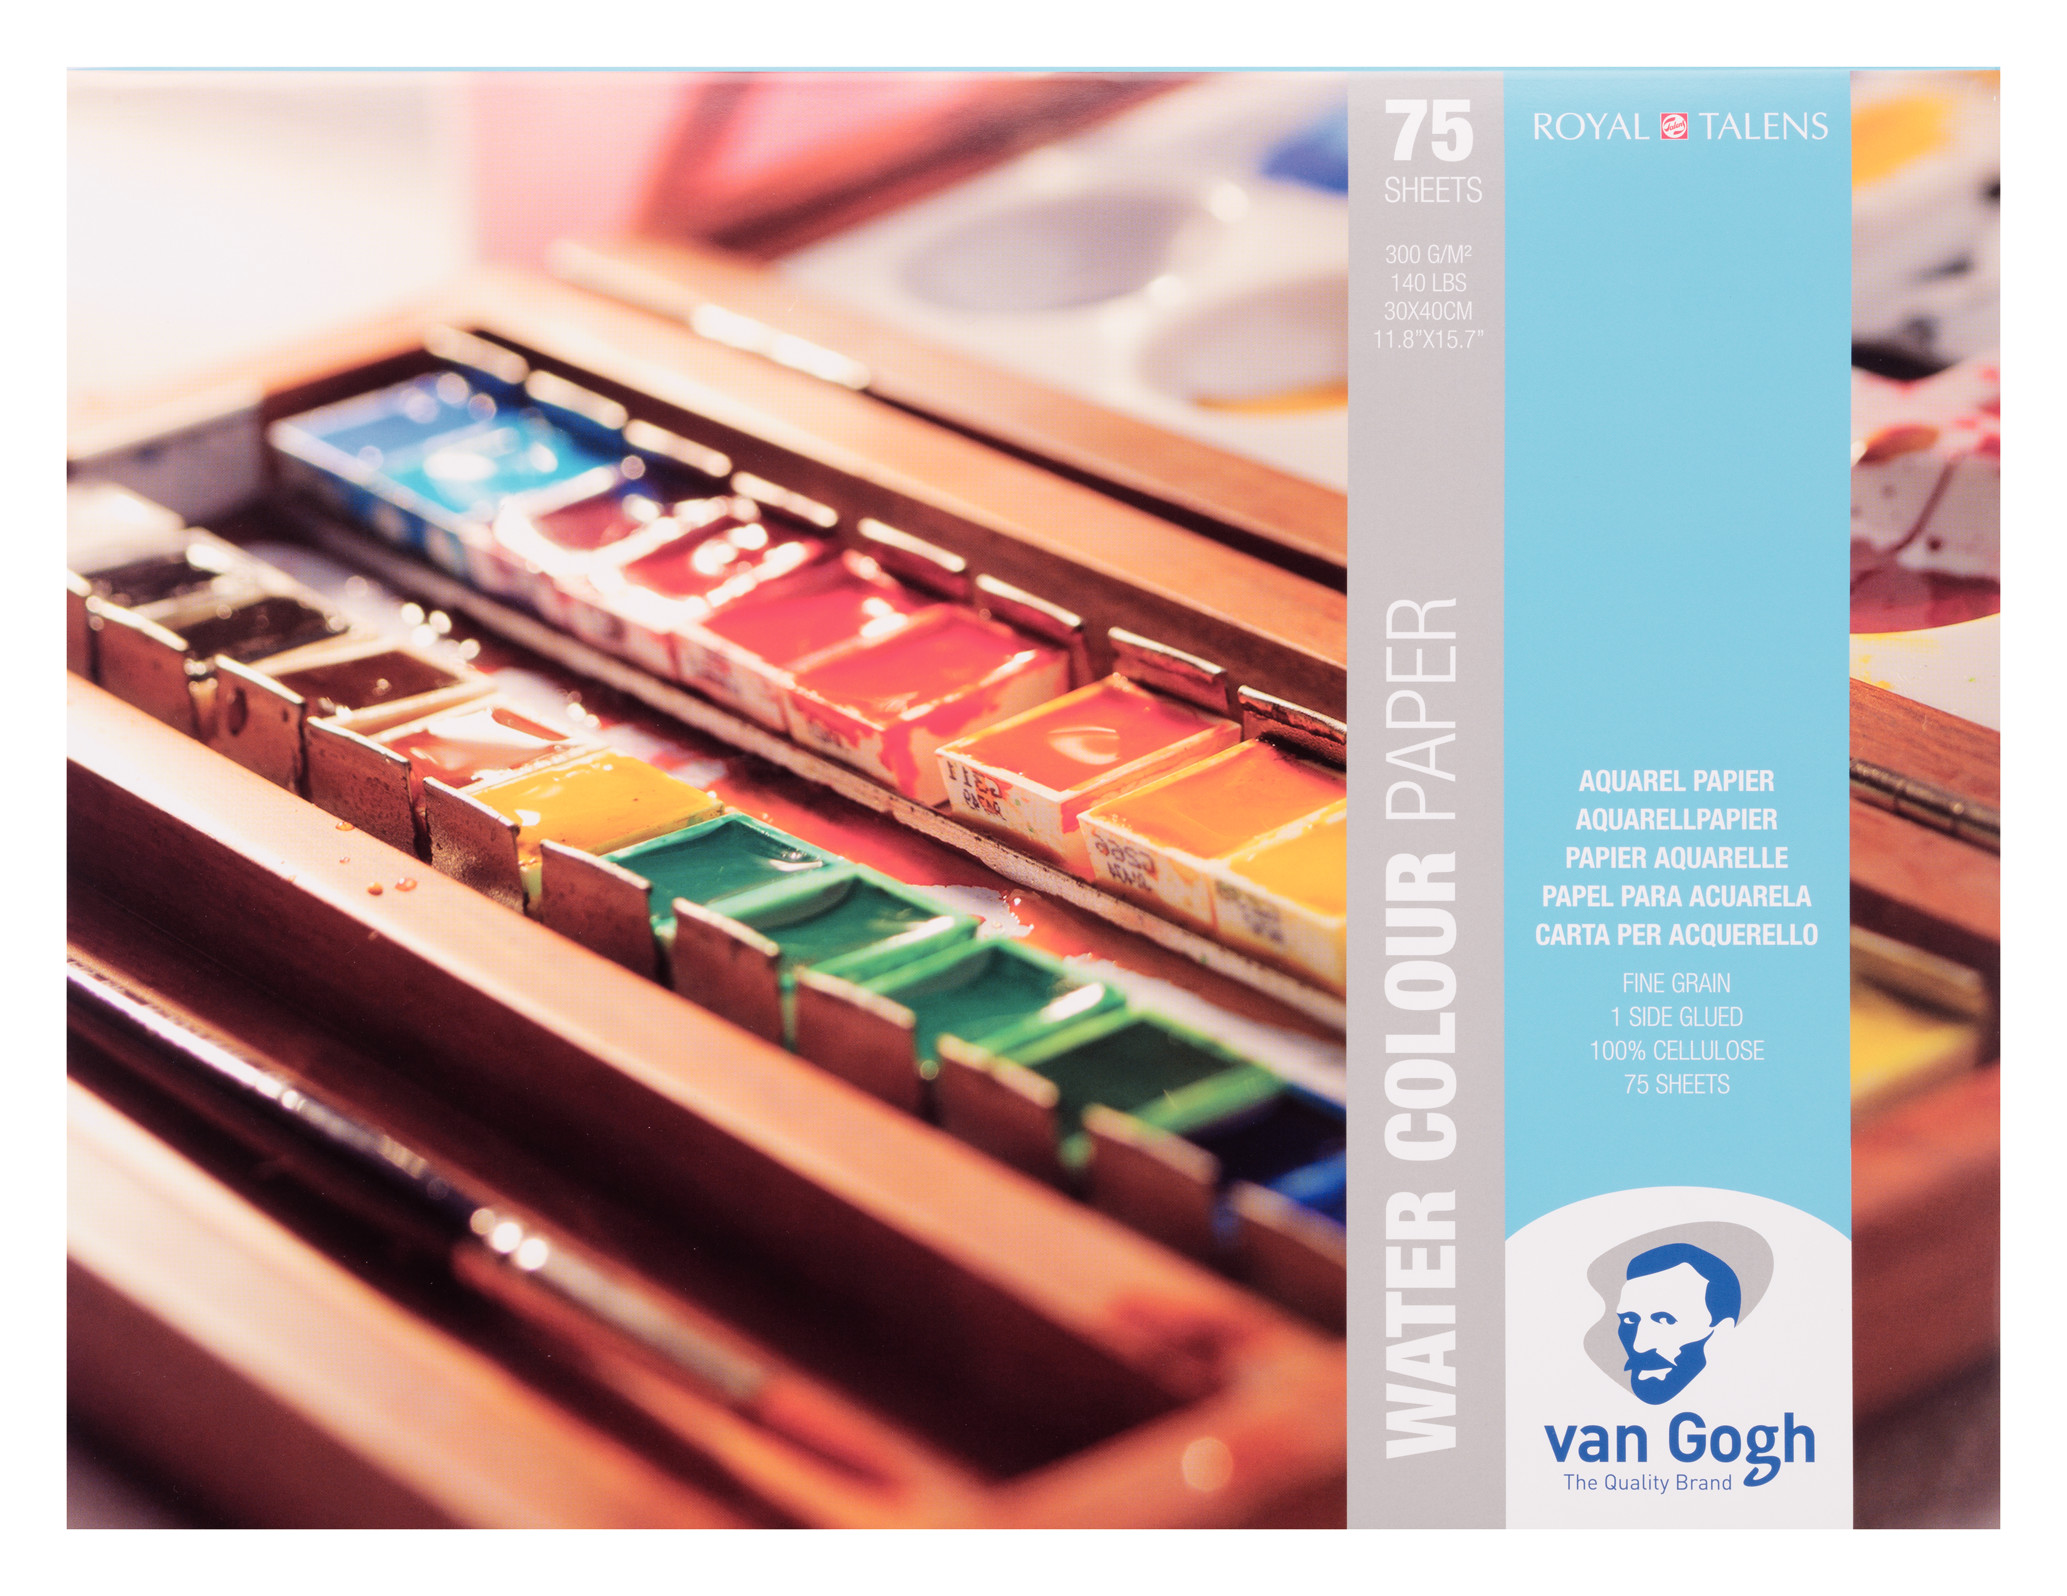 Van Gogh Water Colour Paper Pad, 75 Sheets, 300g/140lb., size 30 x 40cm / 11.8 x 15.7